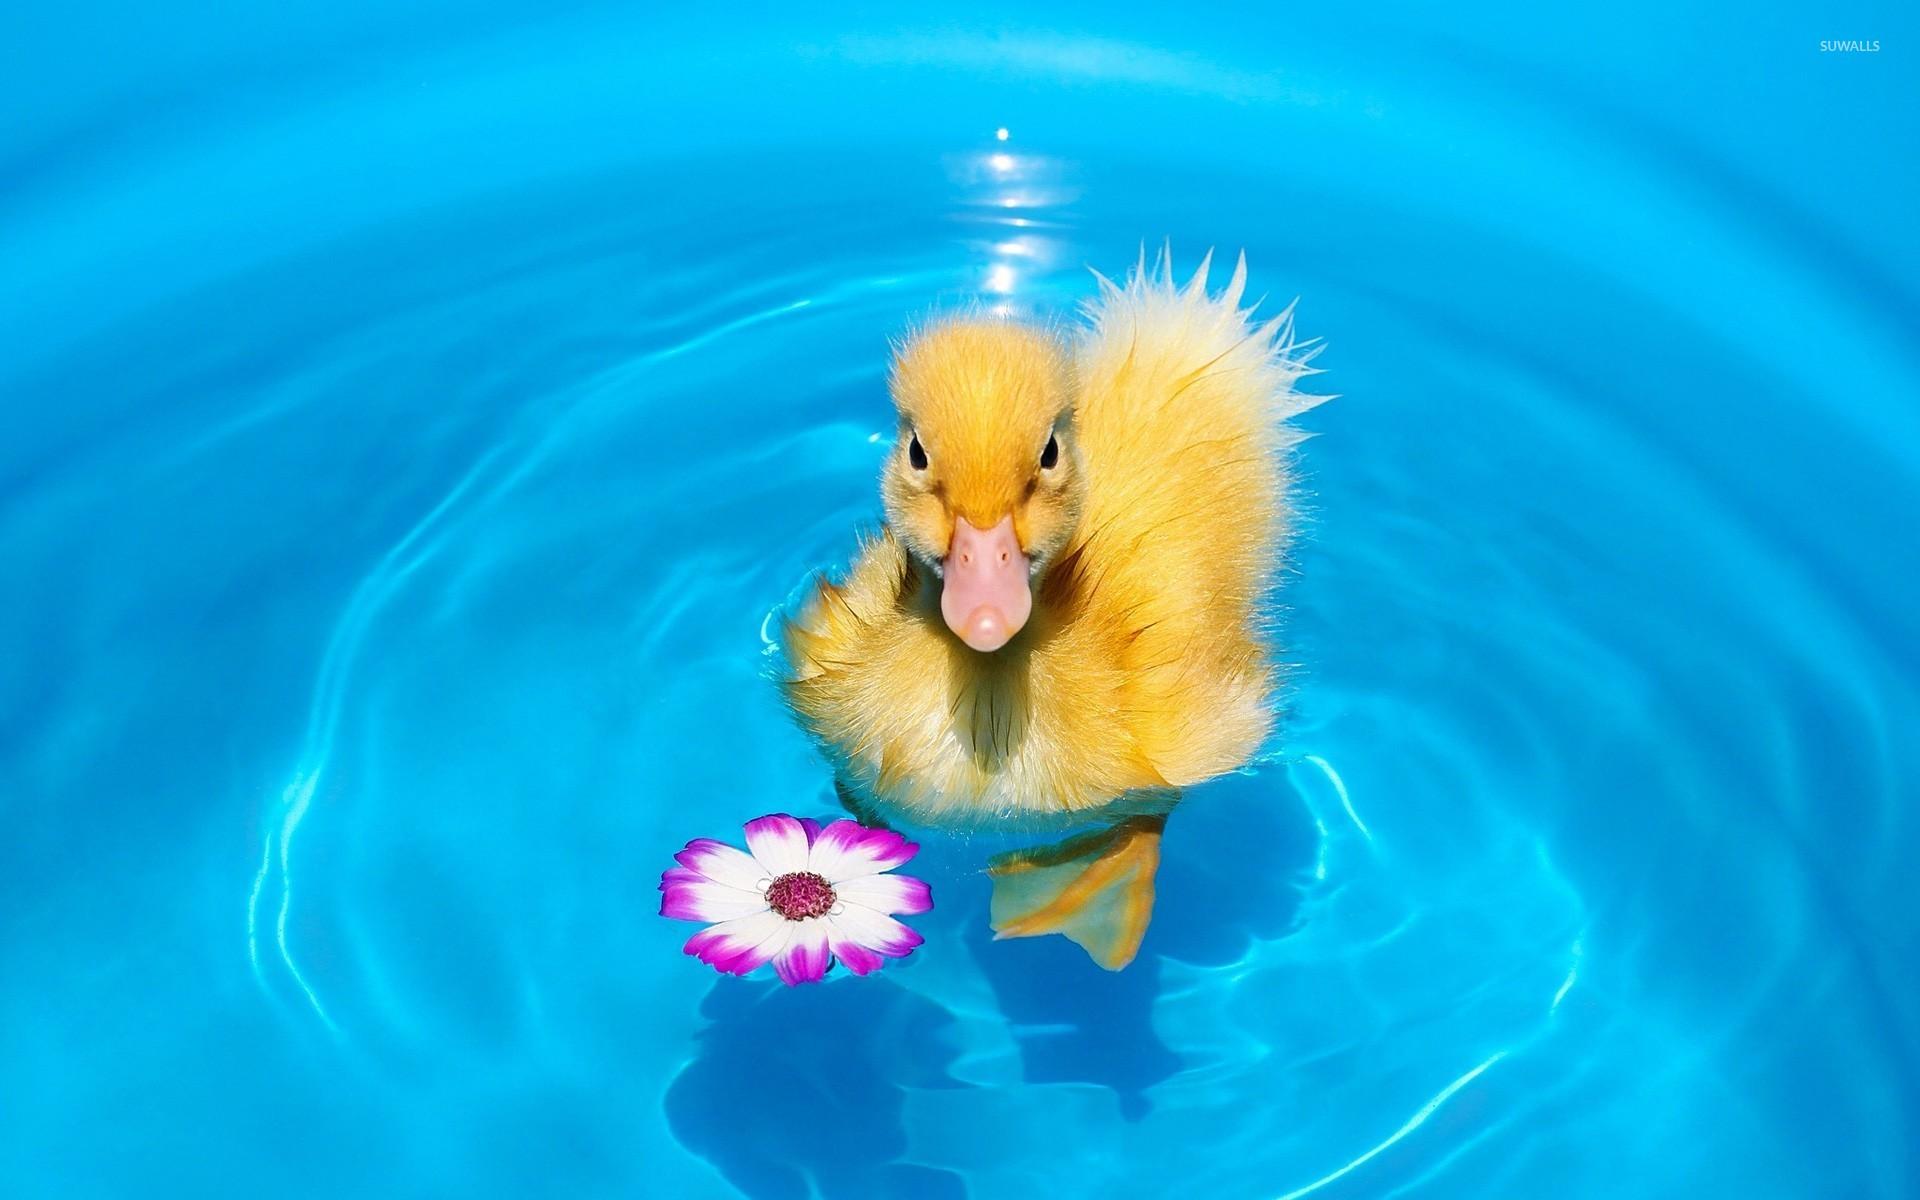 swimming duckling wallpaper animal wallpapers 24899